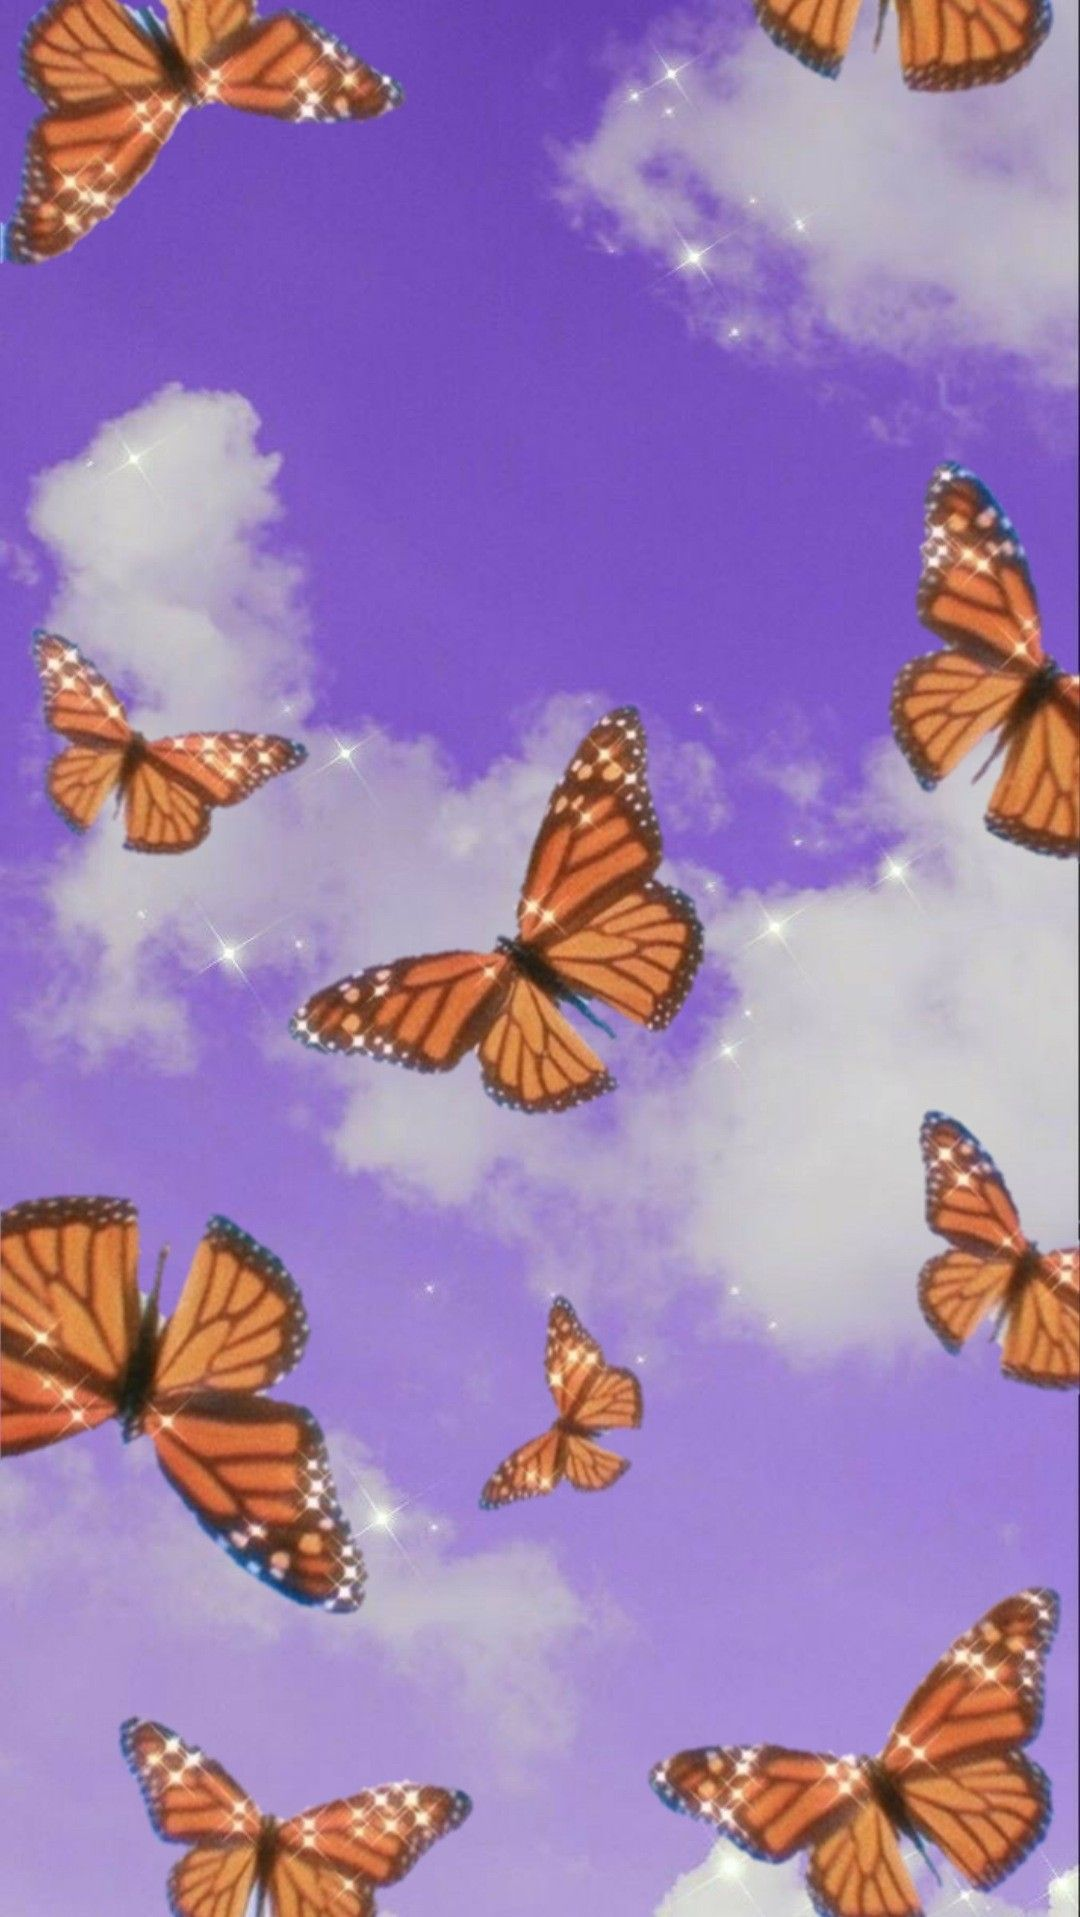 Butterfly Aesthetic Butterfly Wallpaper Iphone Purple Butterfly Wallpaper Purple Wallpaper Iphone